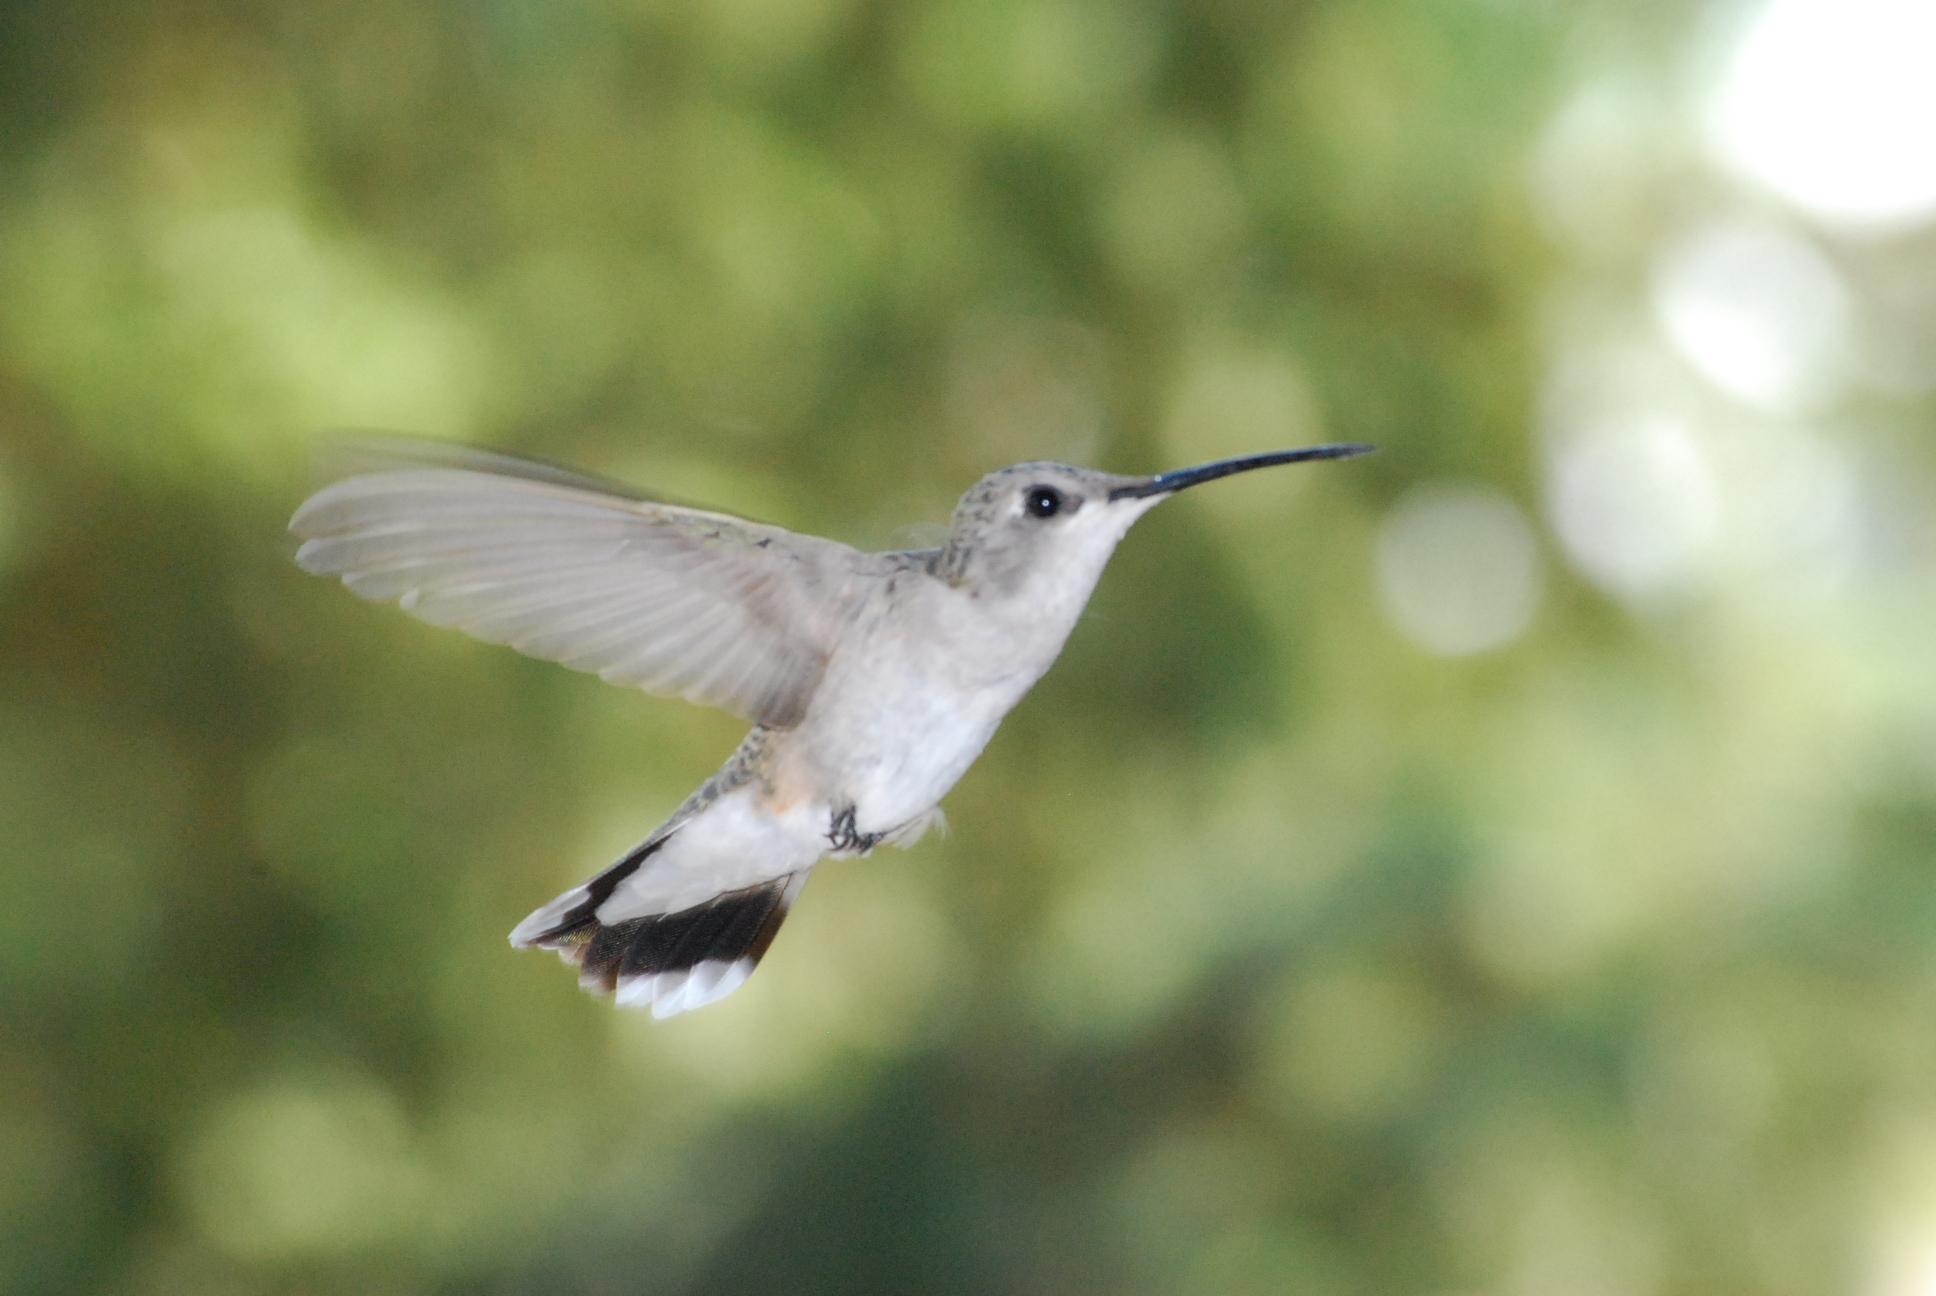 How Hummingbird affects SEO writing